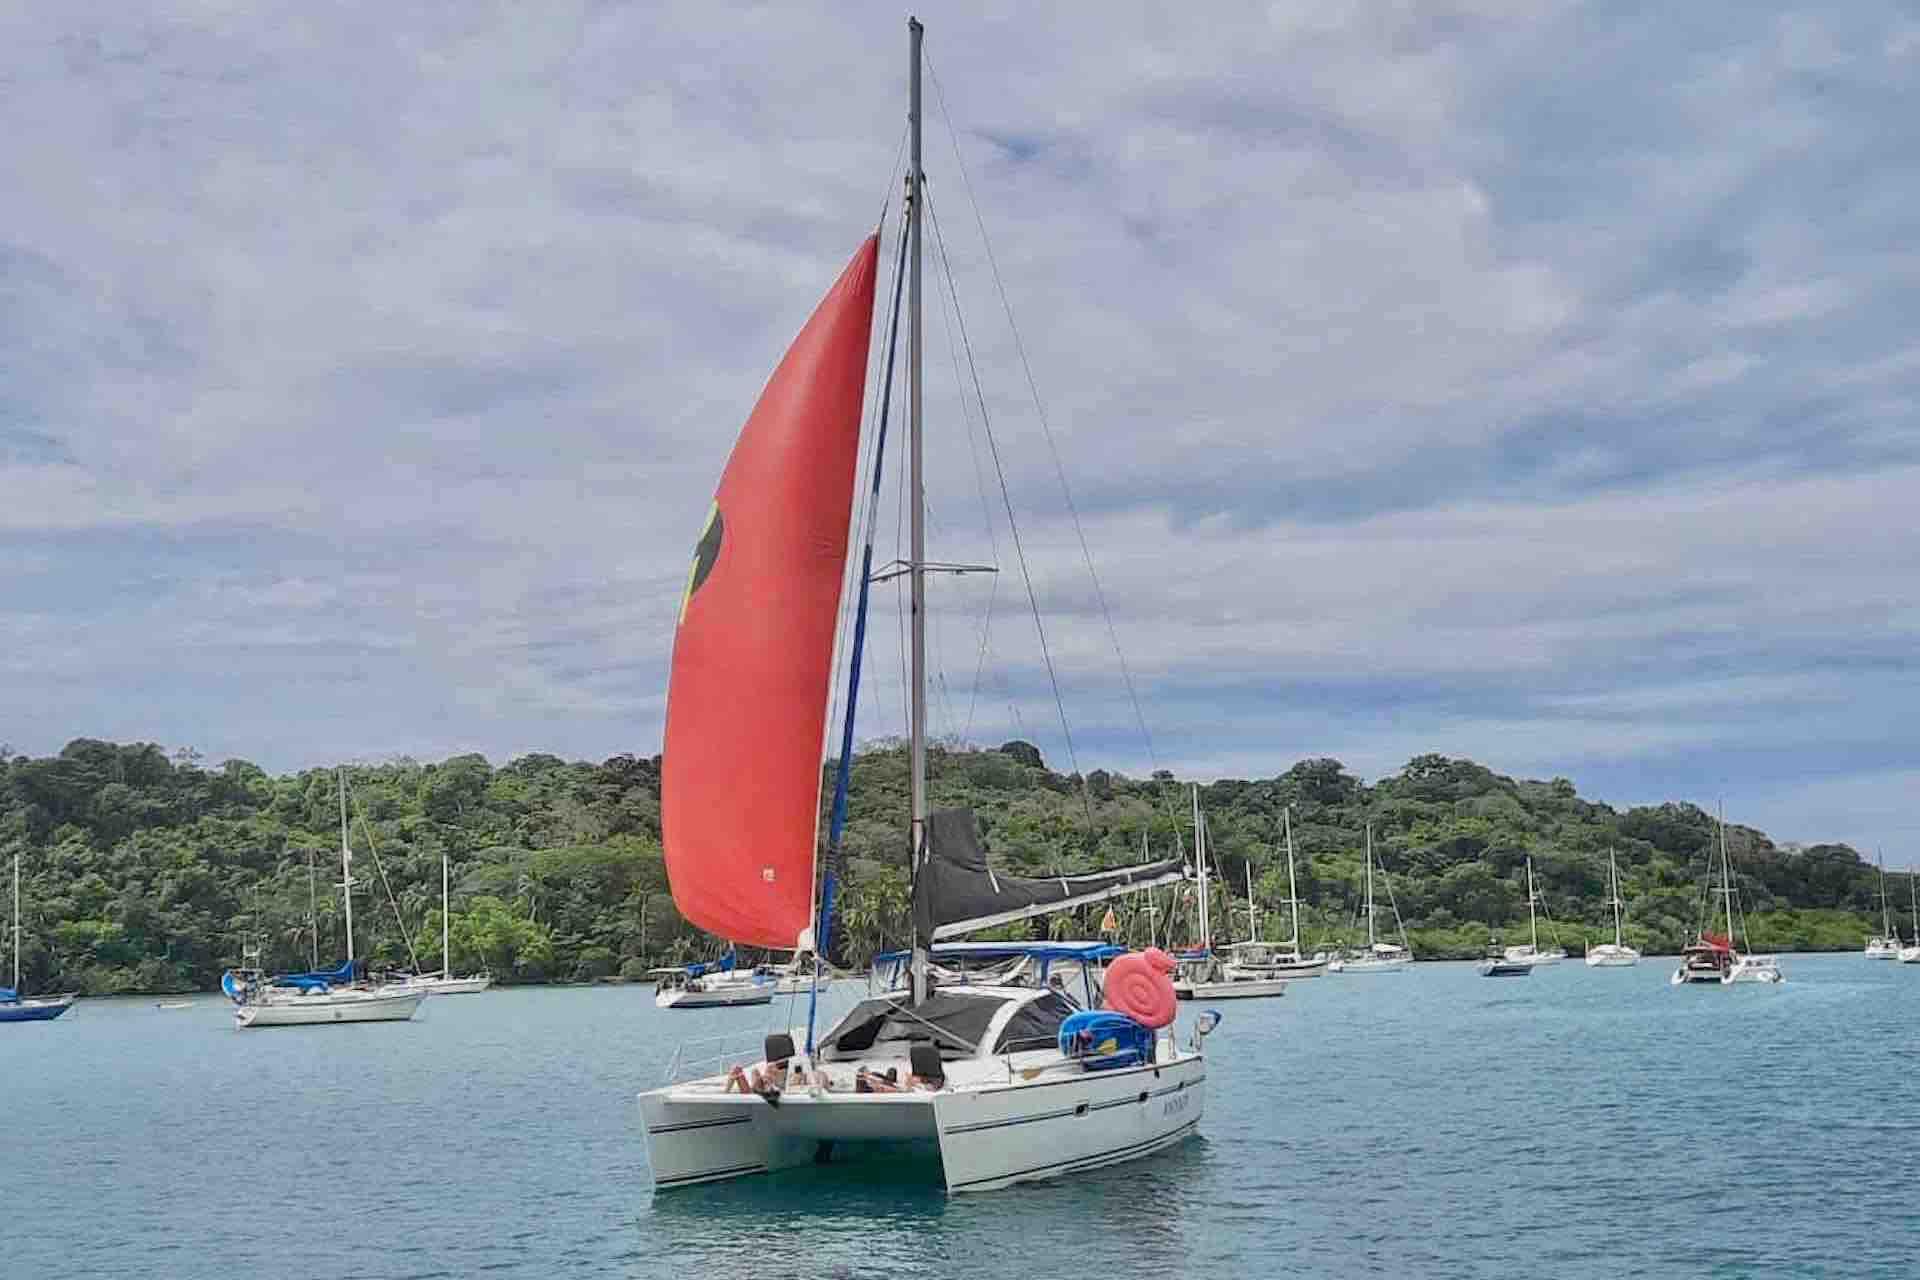 Panama Caribbean tour catamaran sailboat